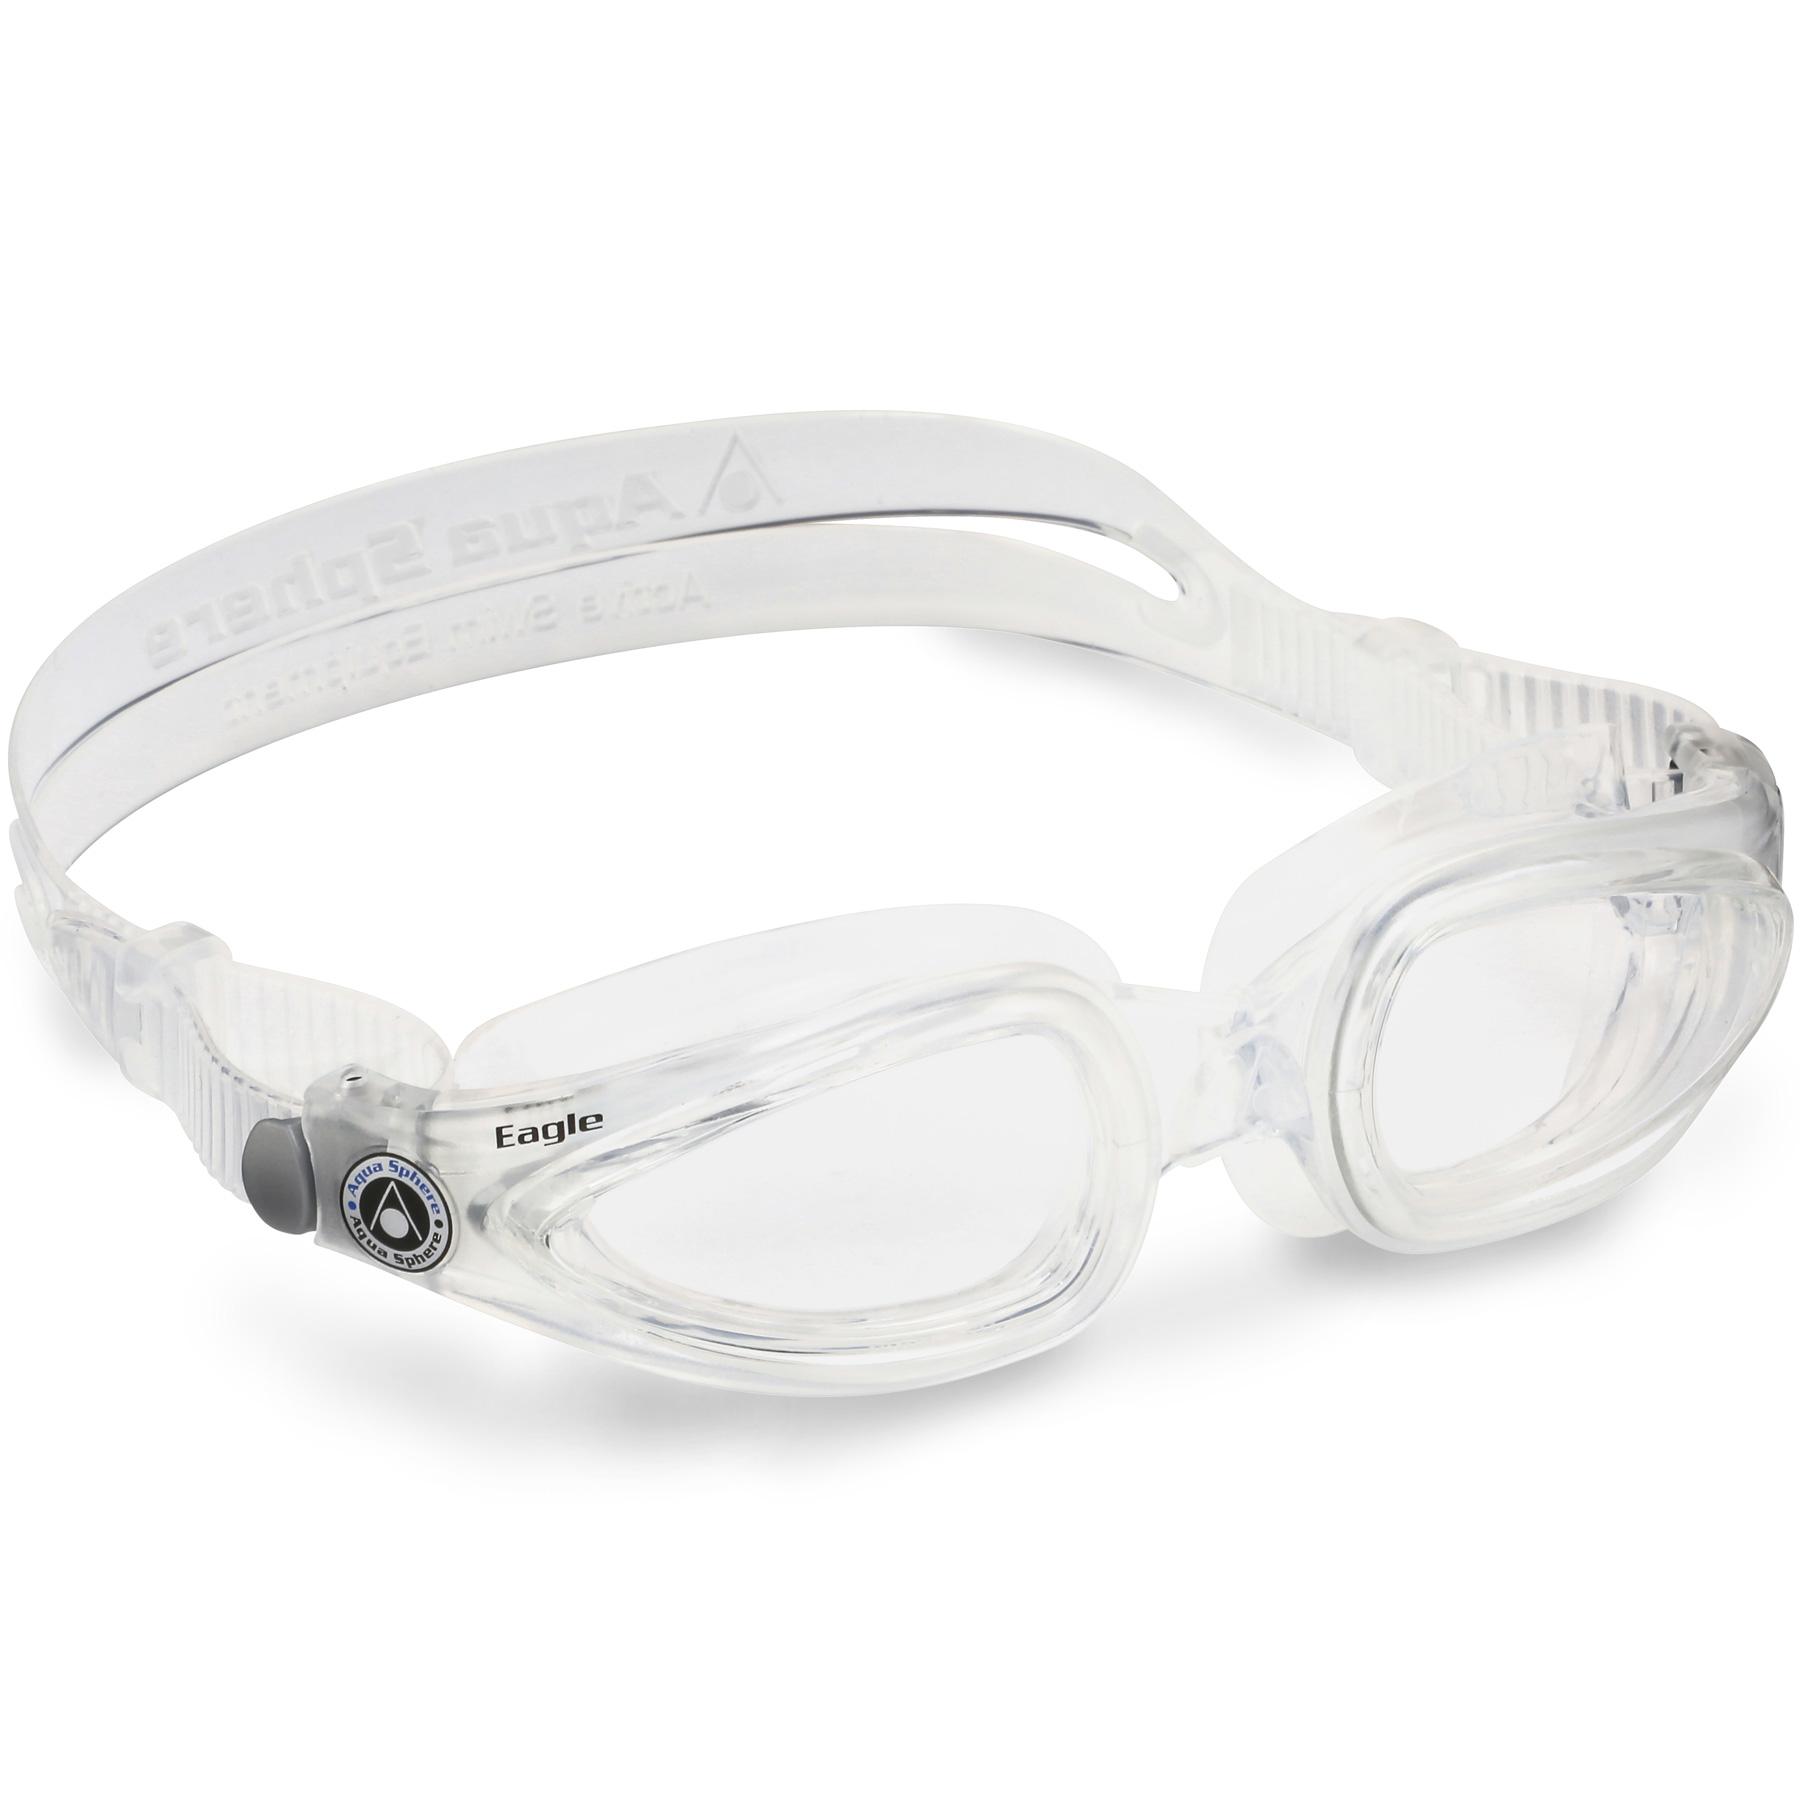 Produktbild von AQUASPHERE EAGLE Schwimmbrille - Clear - L - Clear/Clear